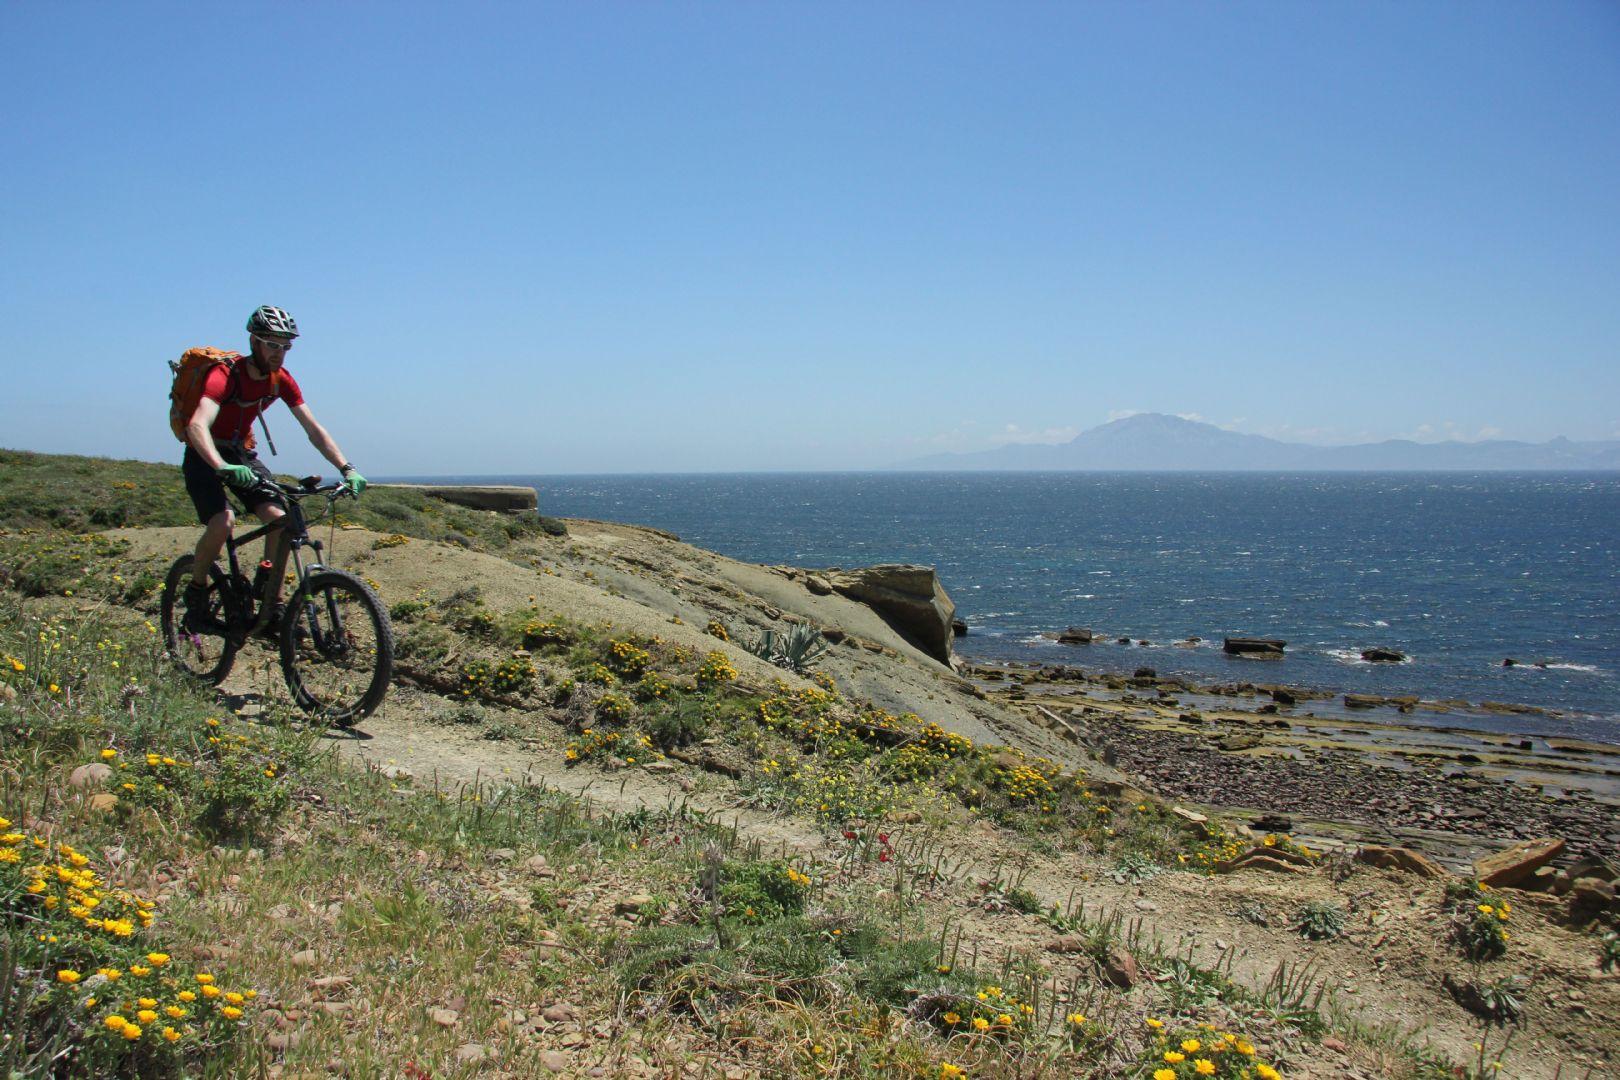 IMG_9458.JPG - Spain - Trans Andaluz - Guided Mountain Bike Holiday - Mountain Biking